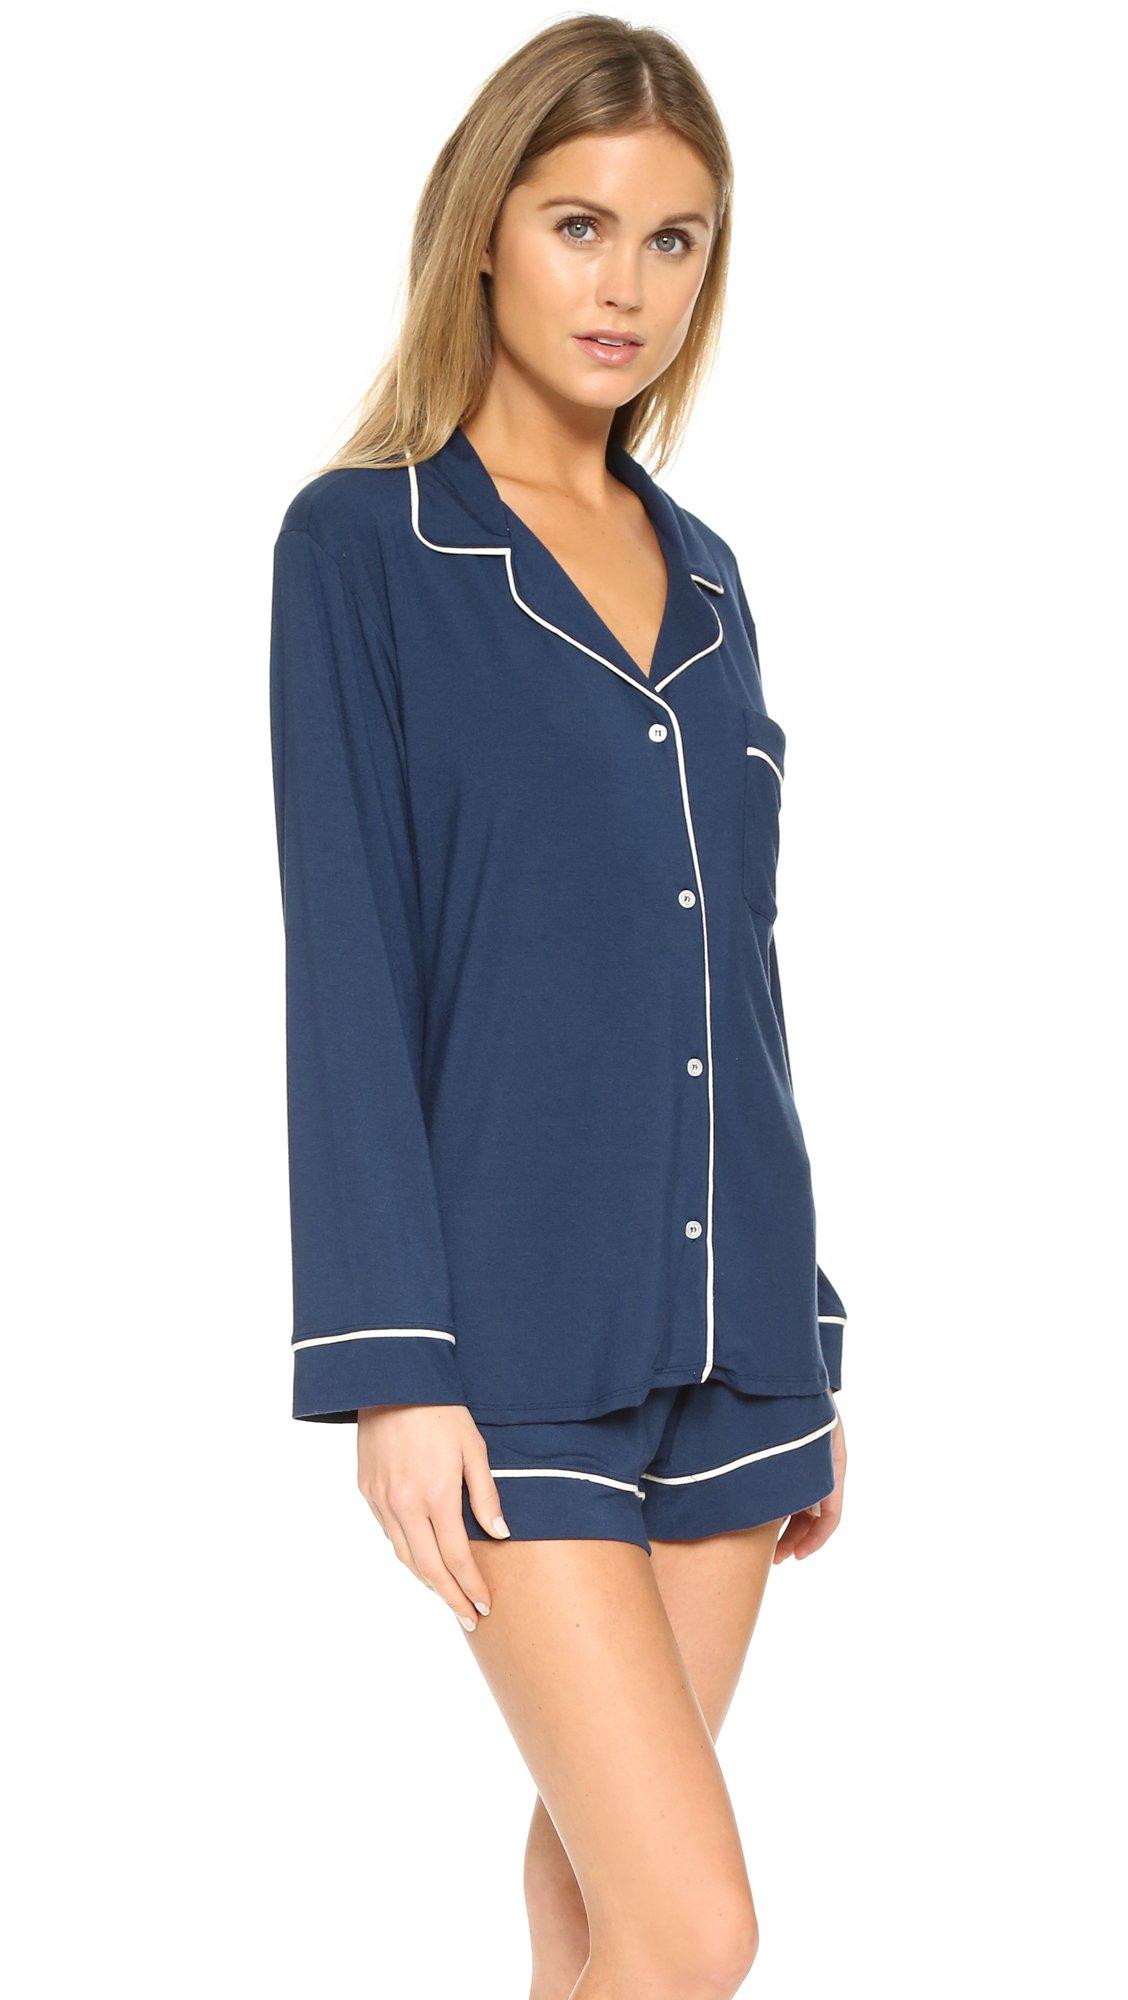 e240e8362 Eberjey Gisele Long Sleeve Pajama Set in Blue - Lyst